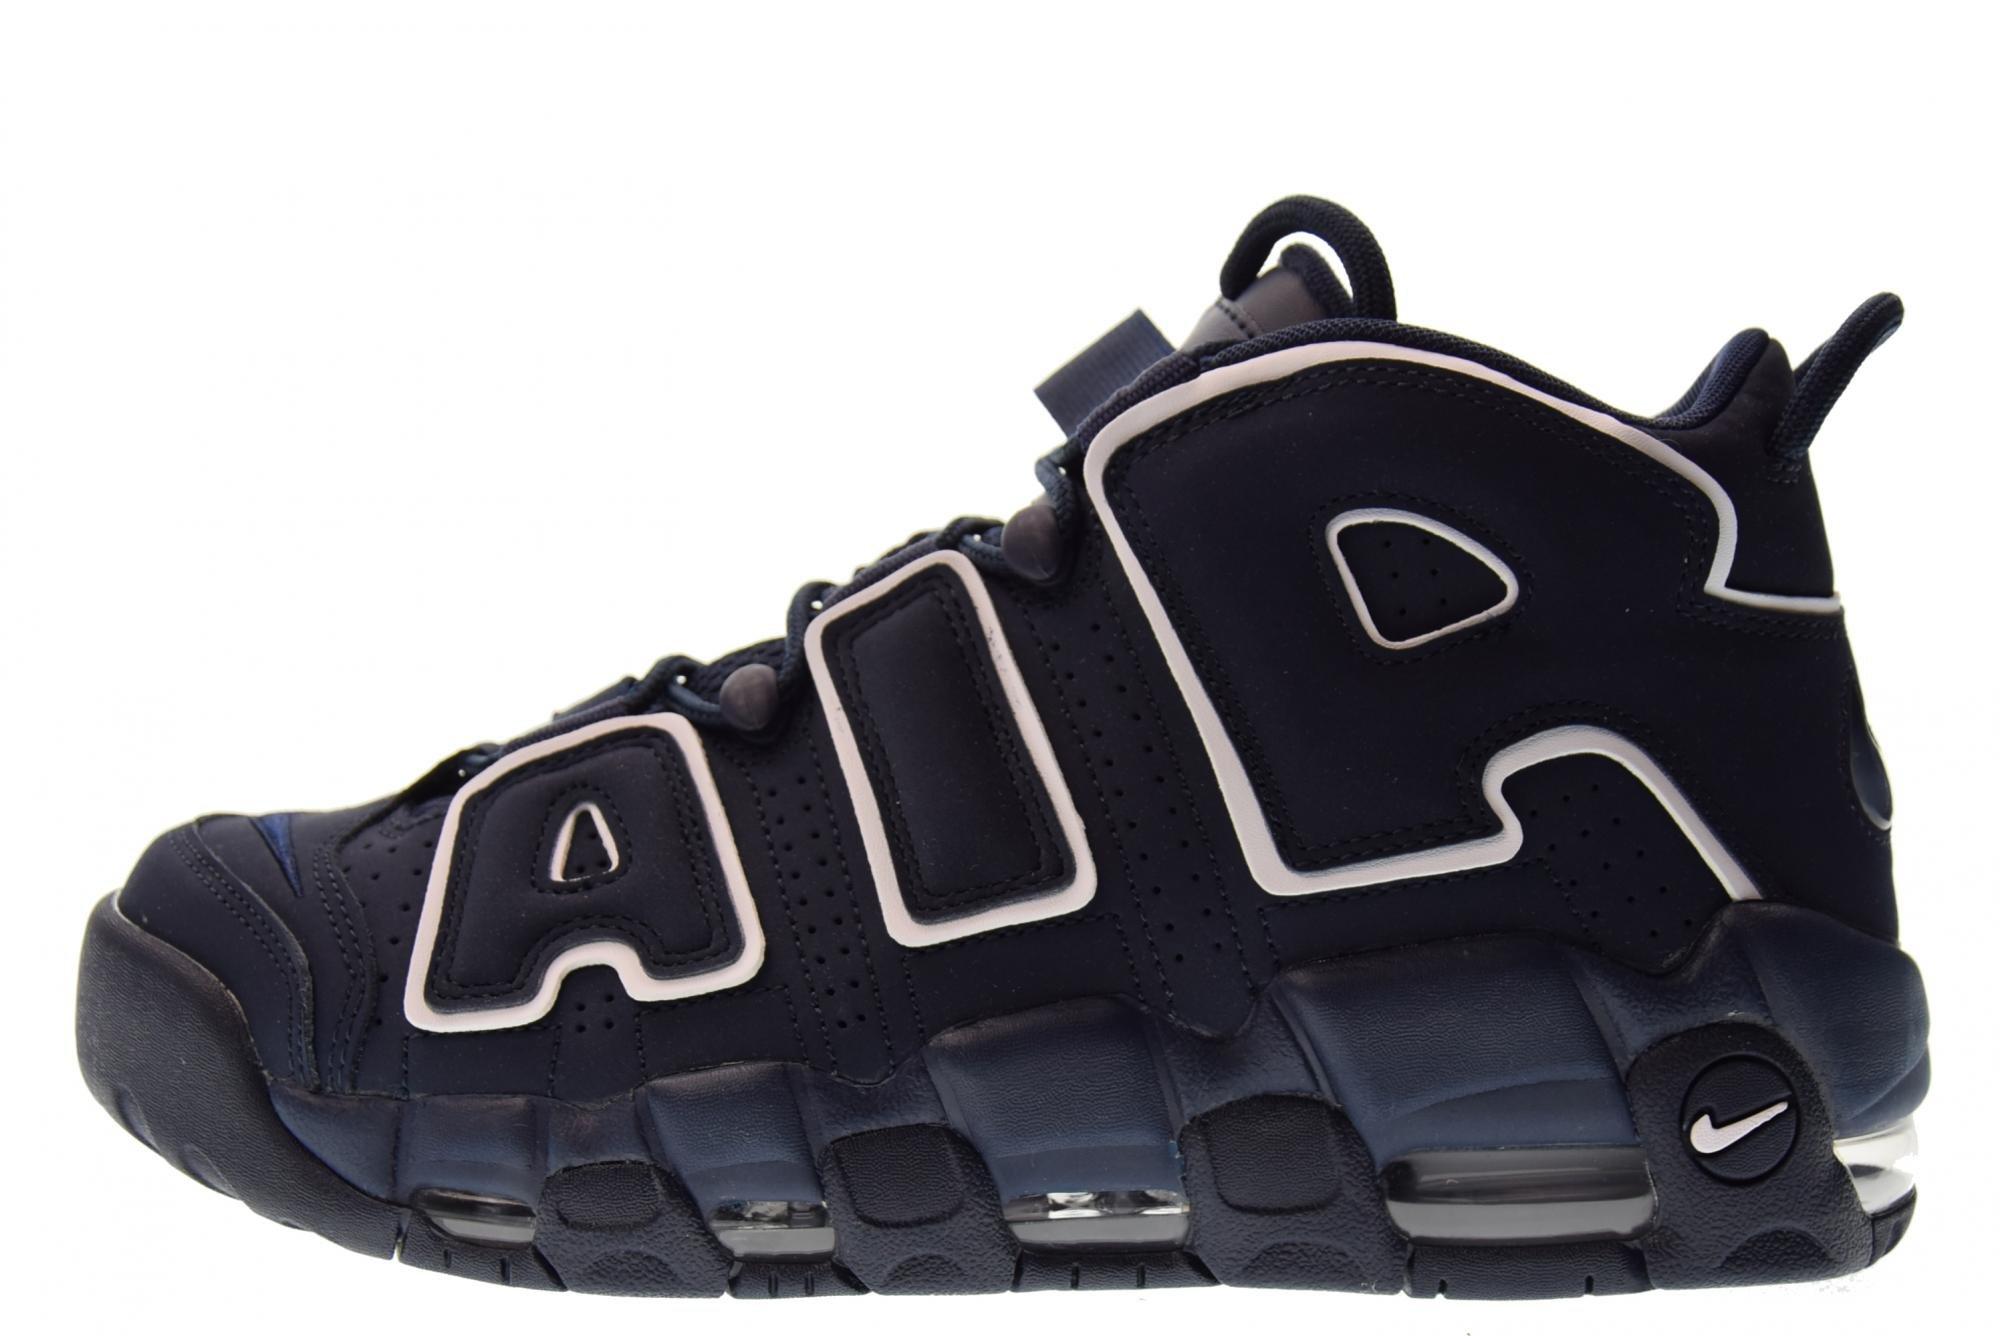 71JMqxu1hNL - Nike Men's Air Huarache International Running Shoes